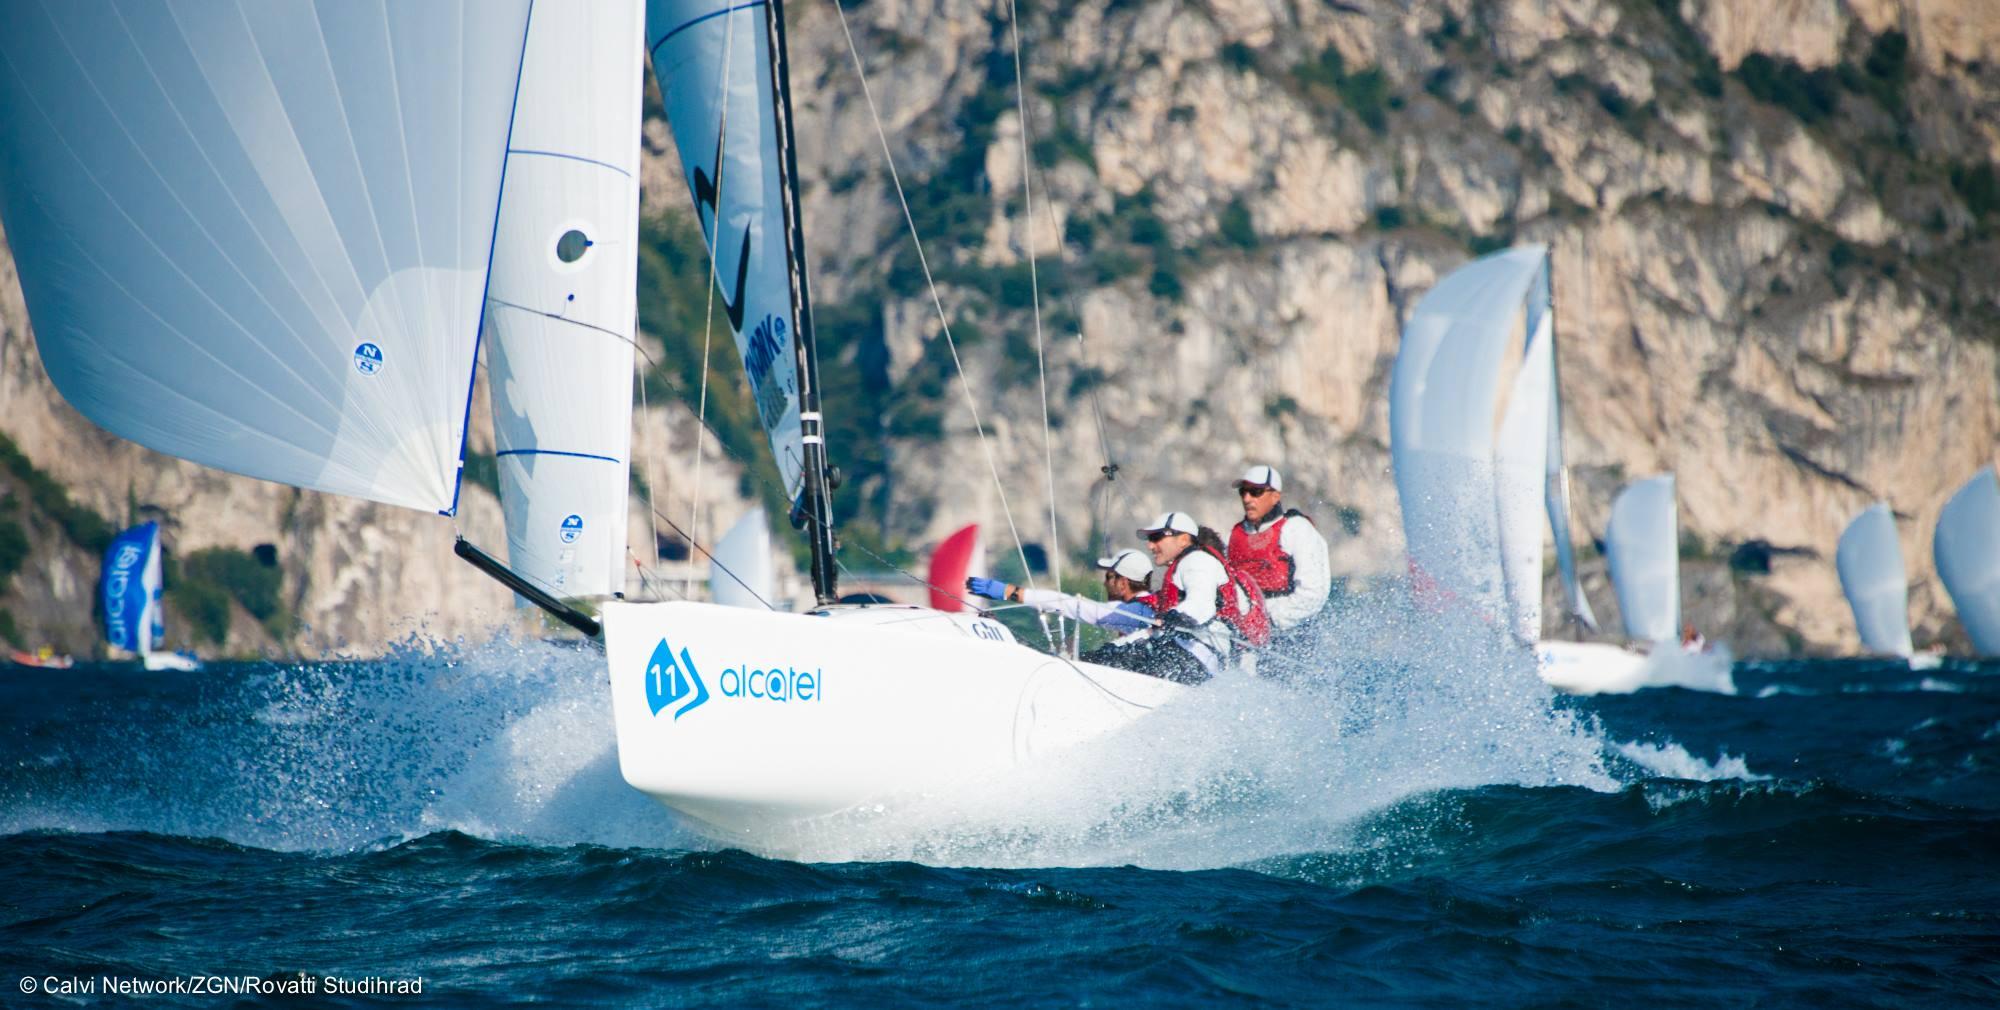 Calvi Network - Alcatel J/70 Cup